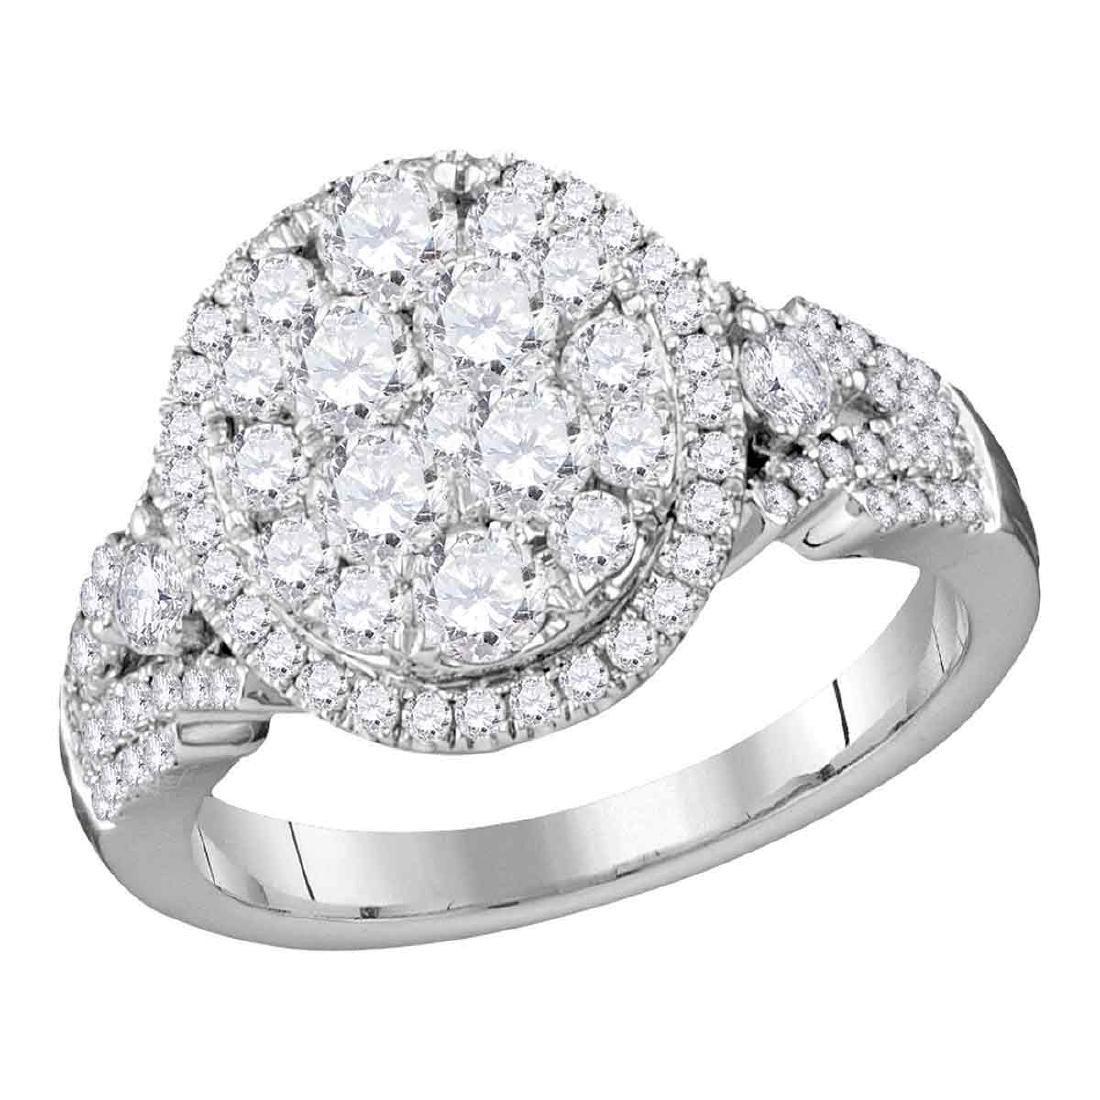 1.53 CTW Diamond Cluster Bridal Engagement Ring 14KT